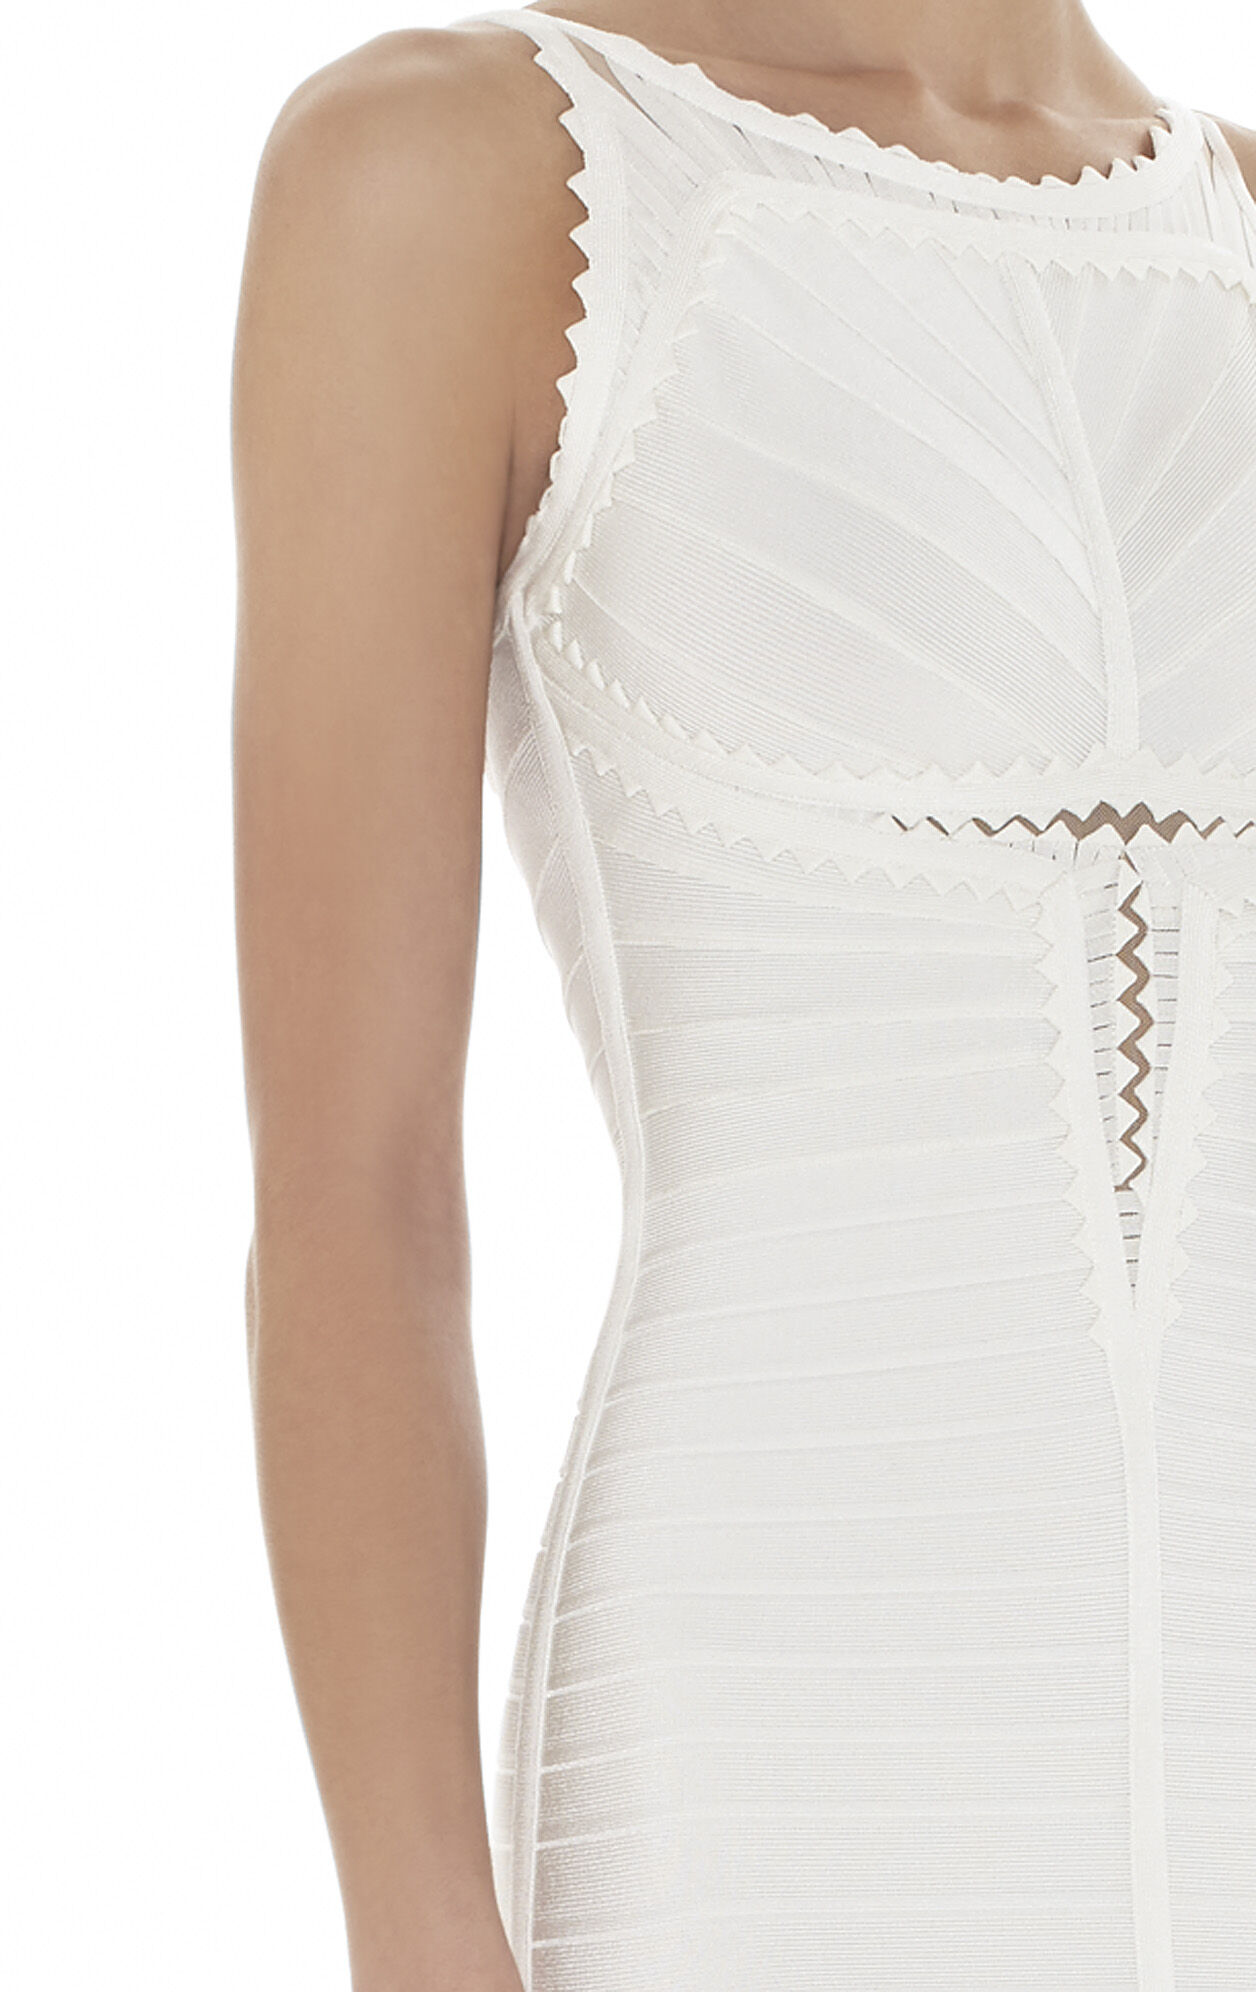 Brookelle Embellished Hand-Crafted Dress